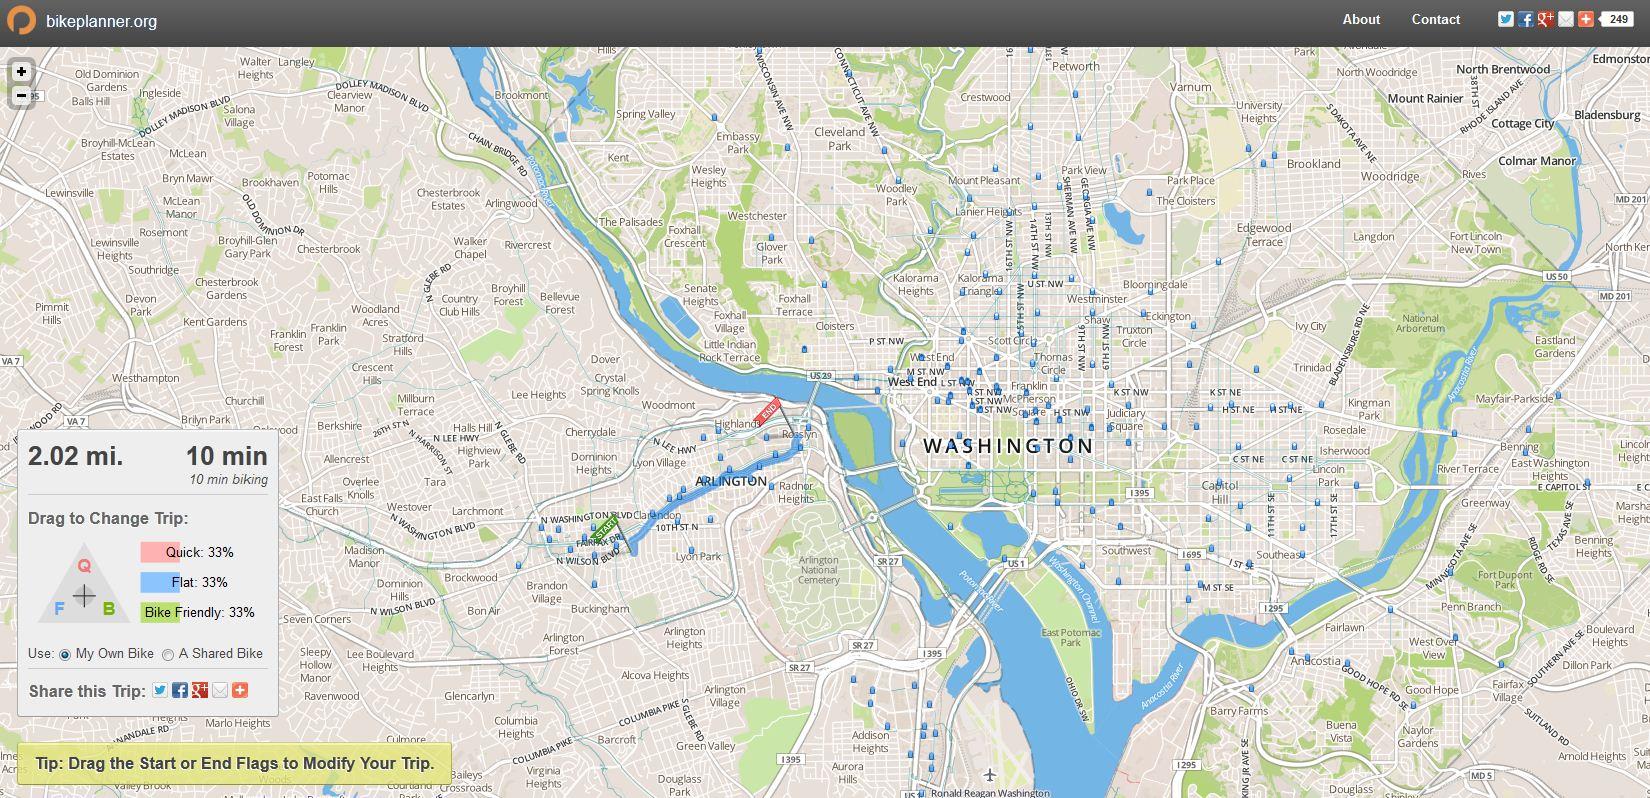 bike planner map